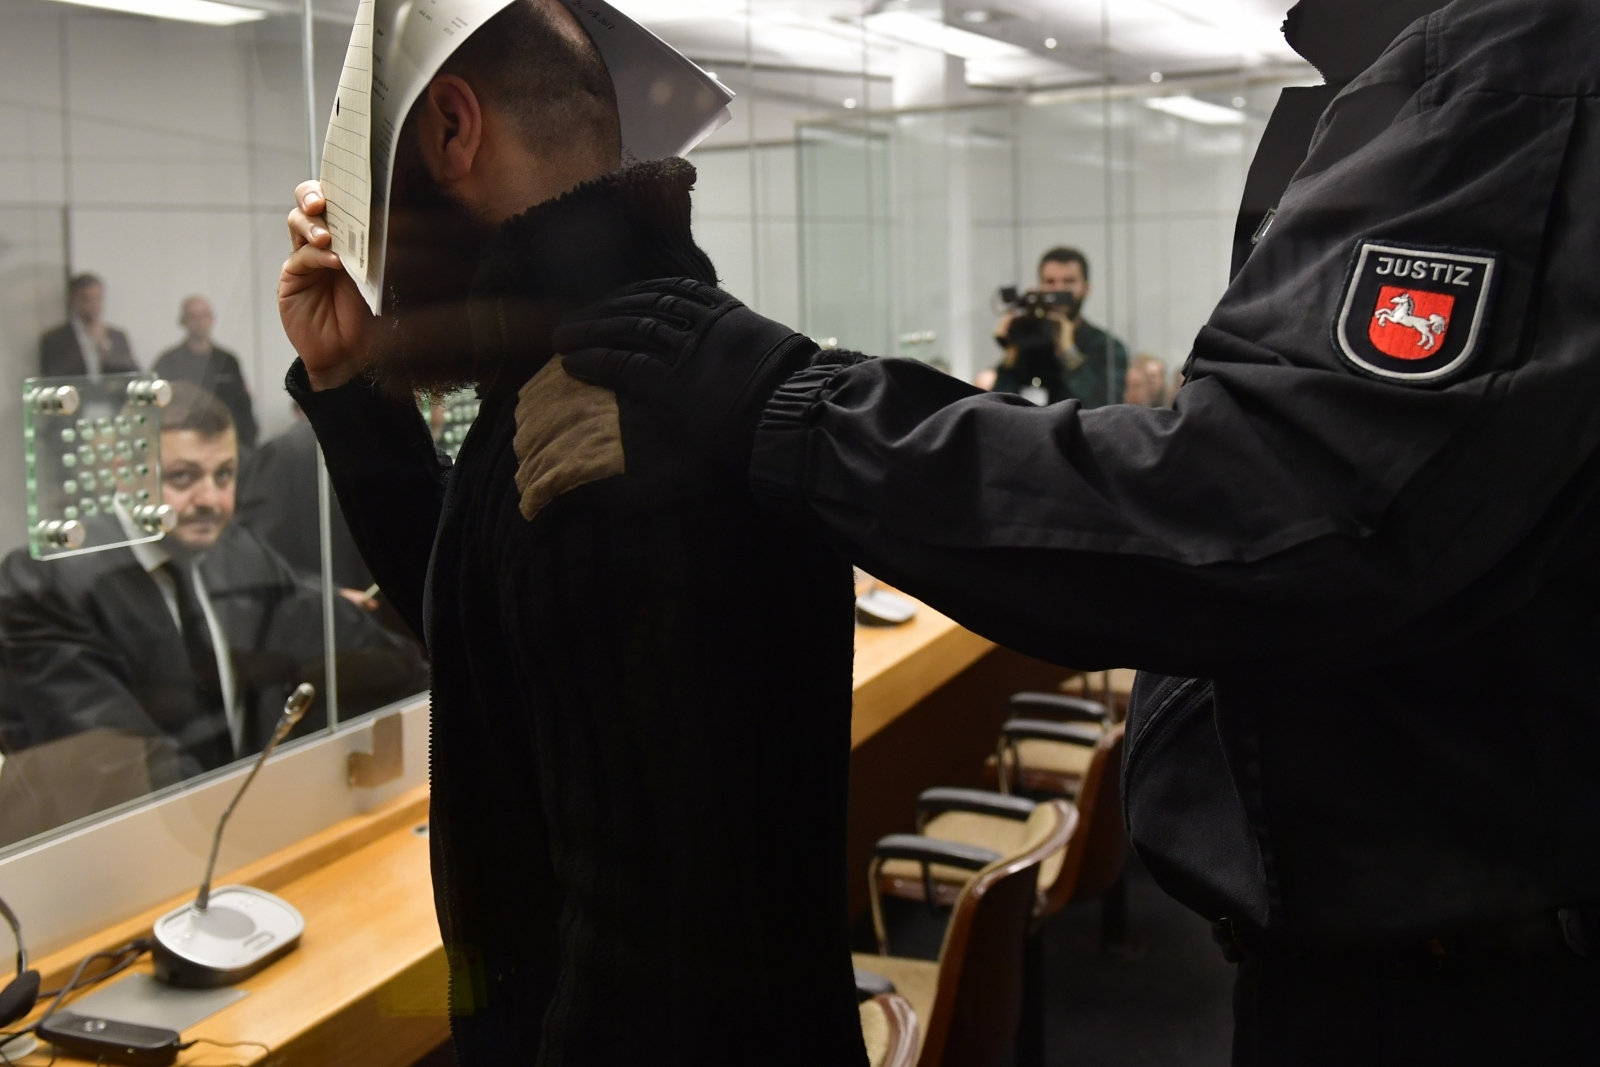 Abu Walaa's trial